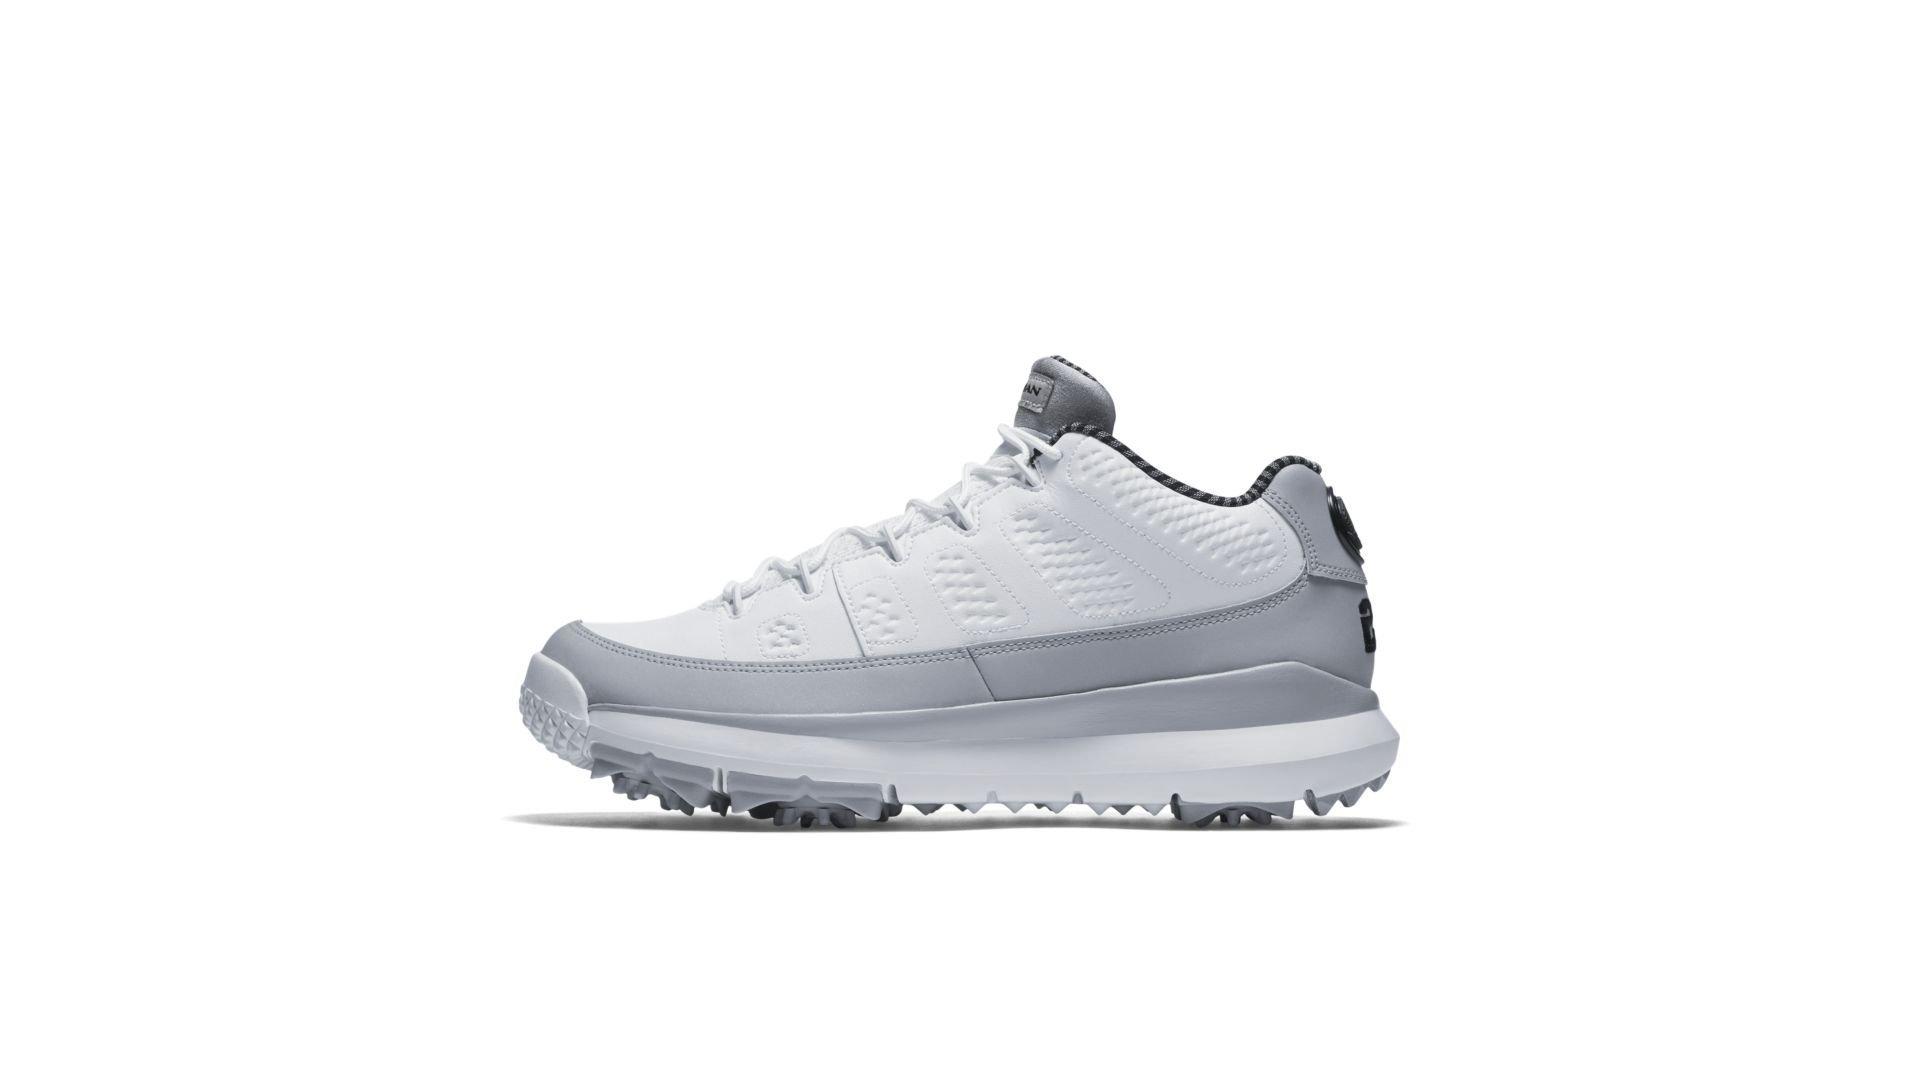 Jordan 9 Retro Golf Cleat Wolf Grey (833798-103)